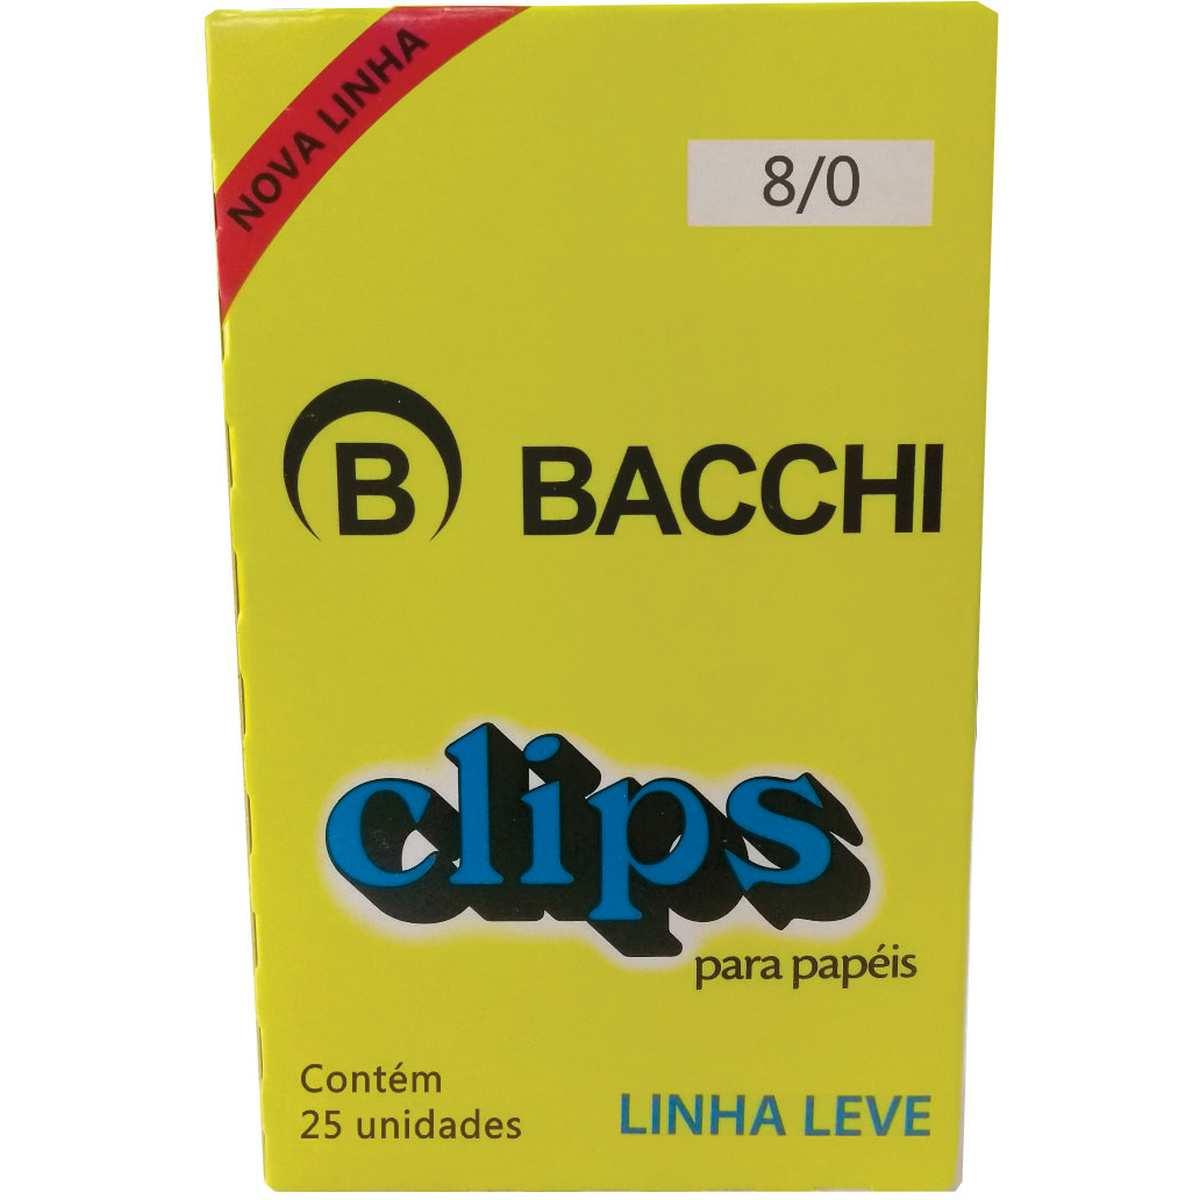 CLIPS METÁLICOS BACCHI Nº 8/0 170UN